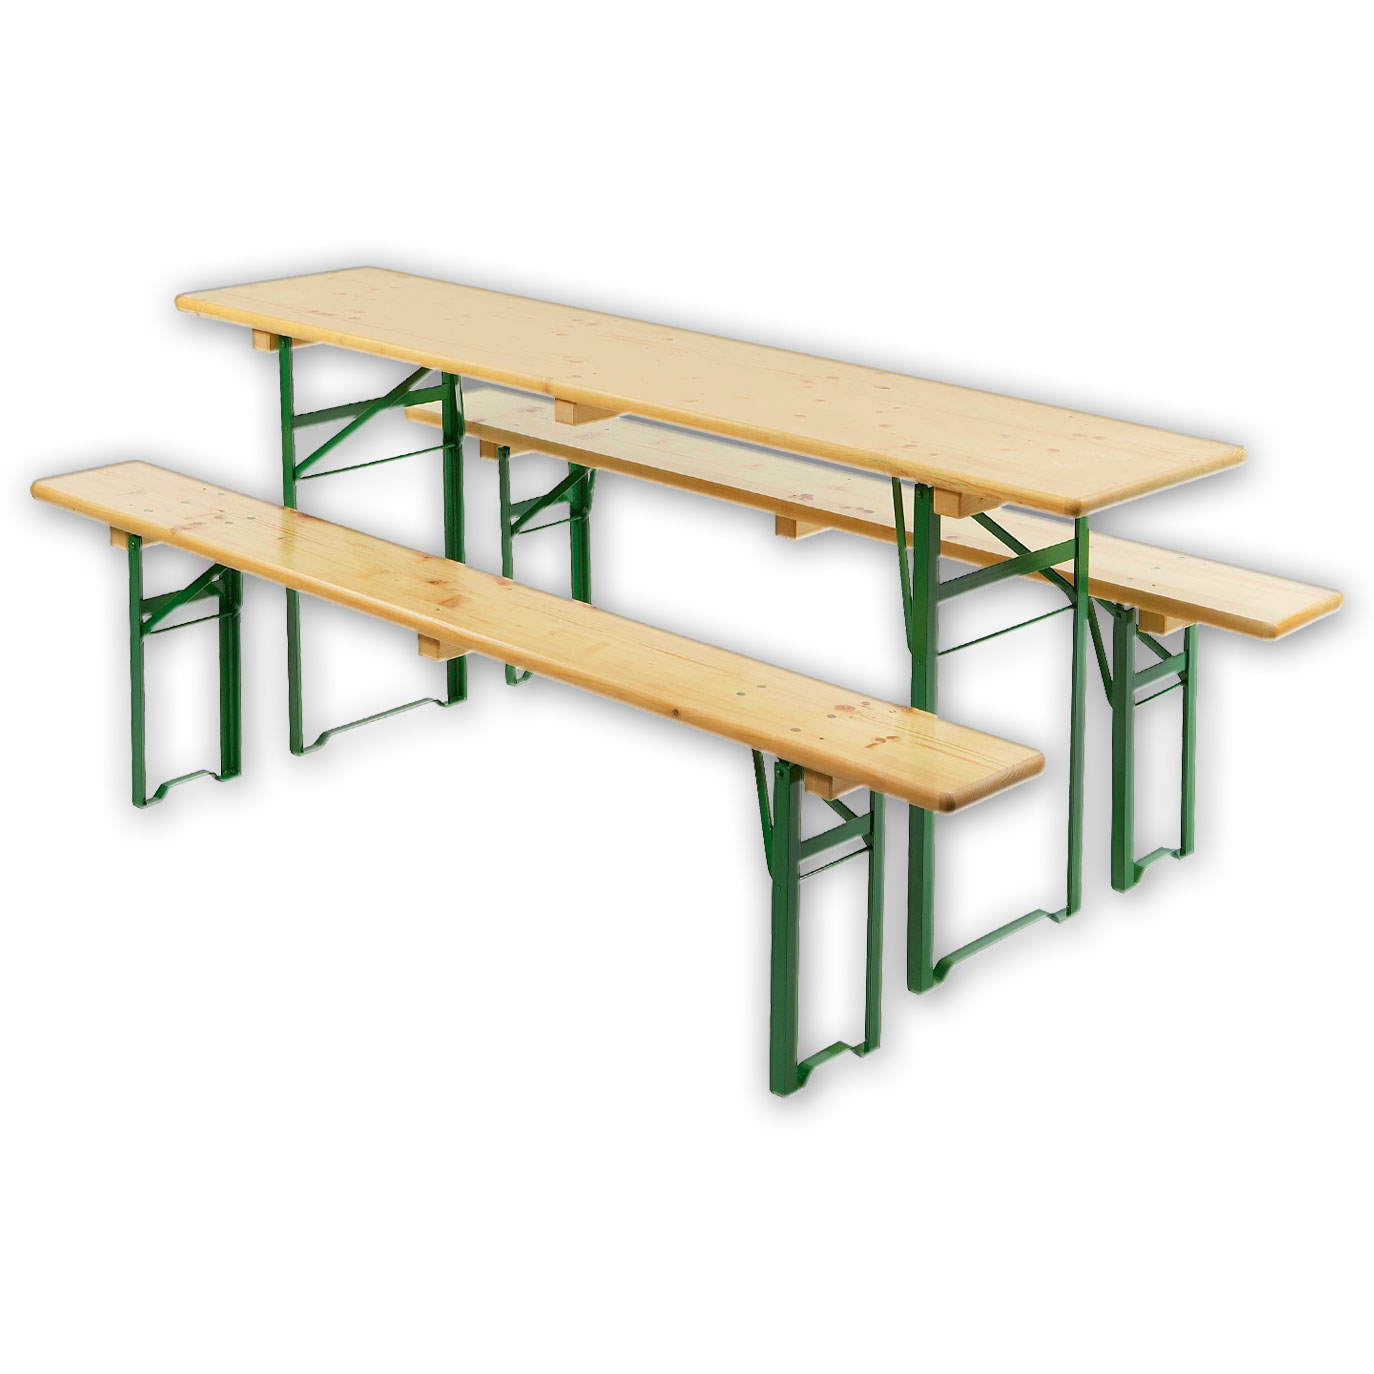 -3-tlg. mit 2 Bänken(L 220 cm, T 25 cm, H 49 cm) und 1 Tisch(L 220 cm, B 50cm, H 76cm) – Sitzhöhe: 49cm